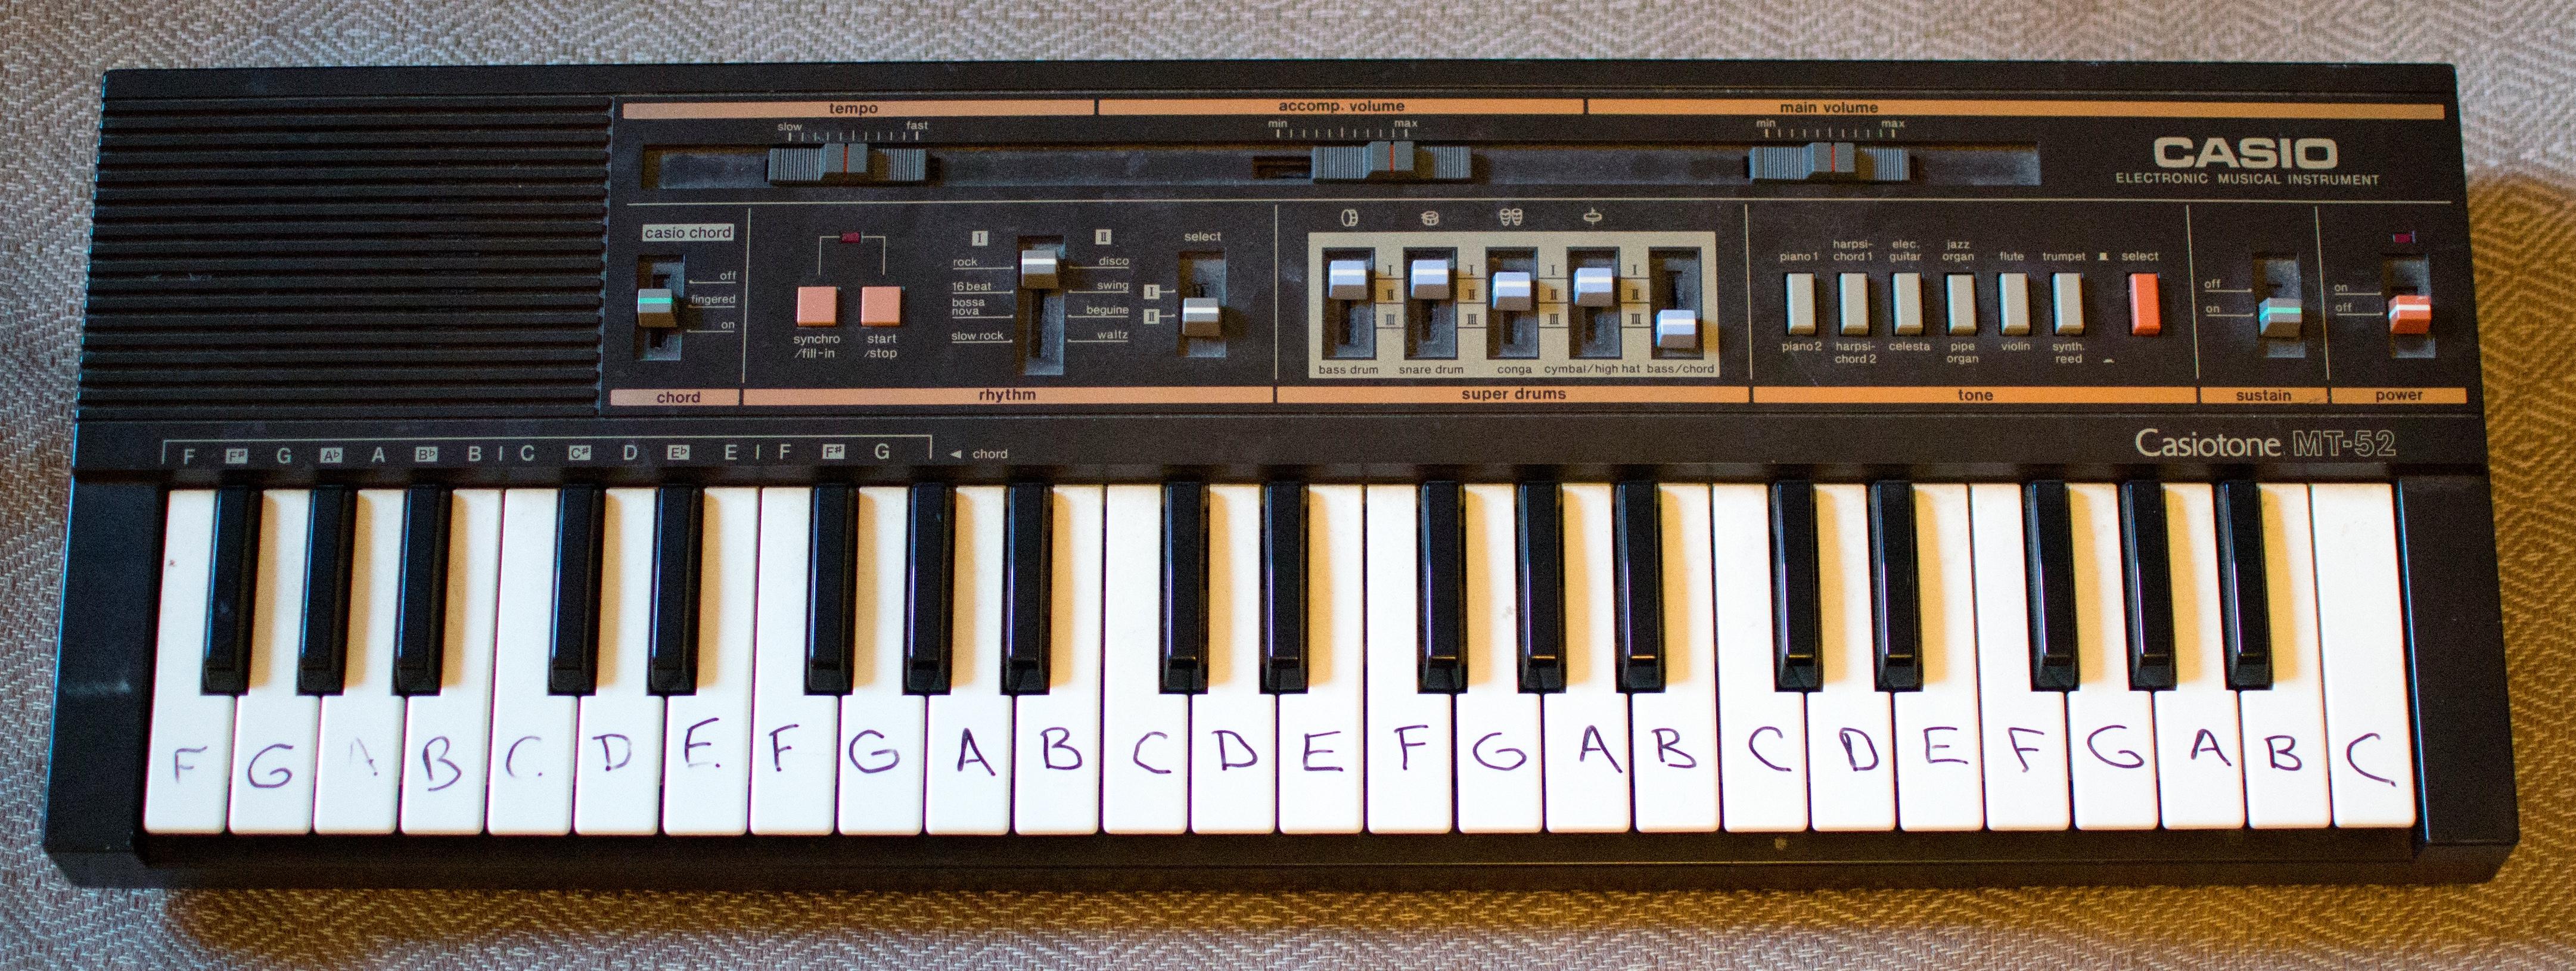 A nice casio MT focused on drum variations - Reviews Casio